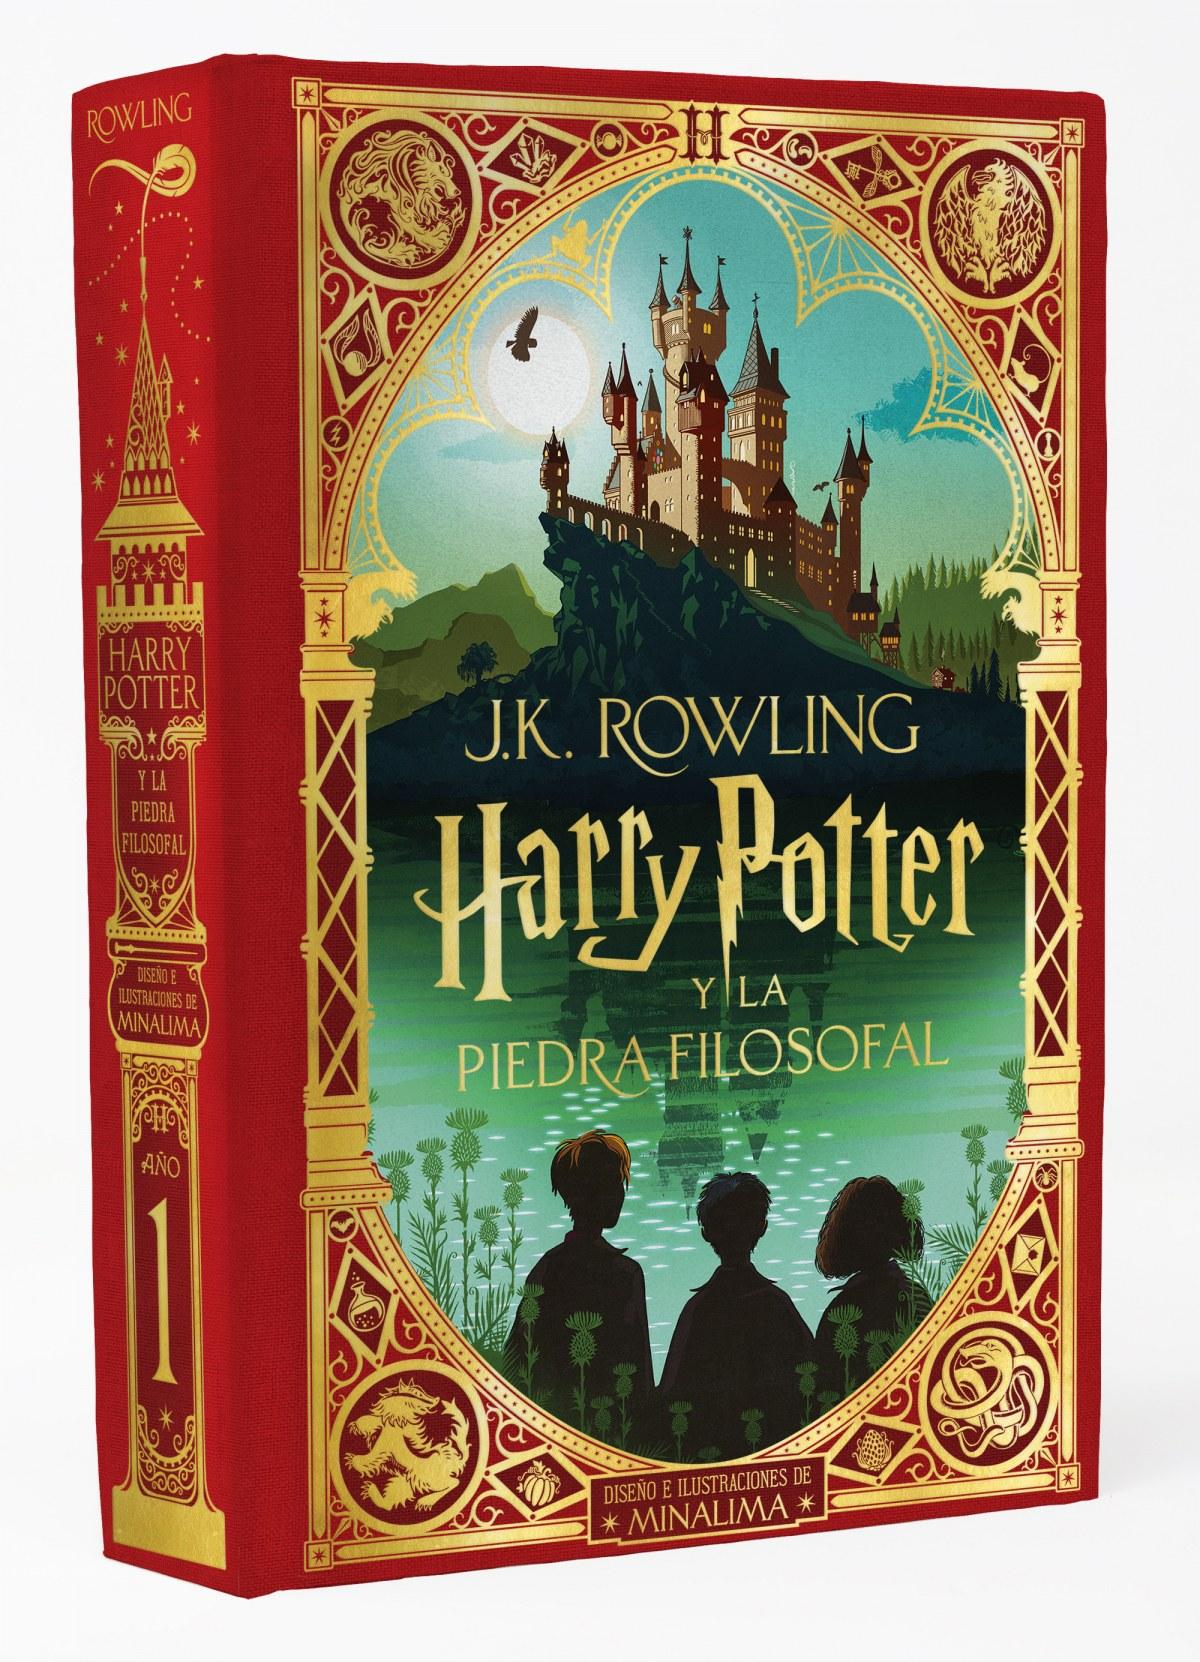 Harry Potter y la piedra filosofal (Ed. Minalima) (Harry Potter 1) 9788418174070